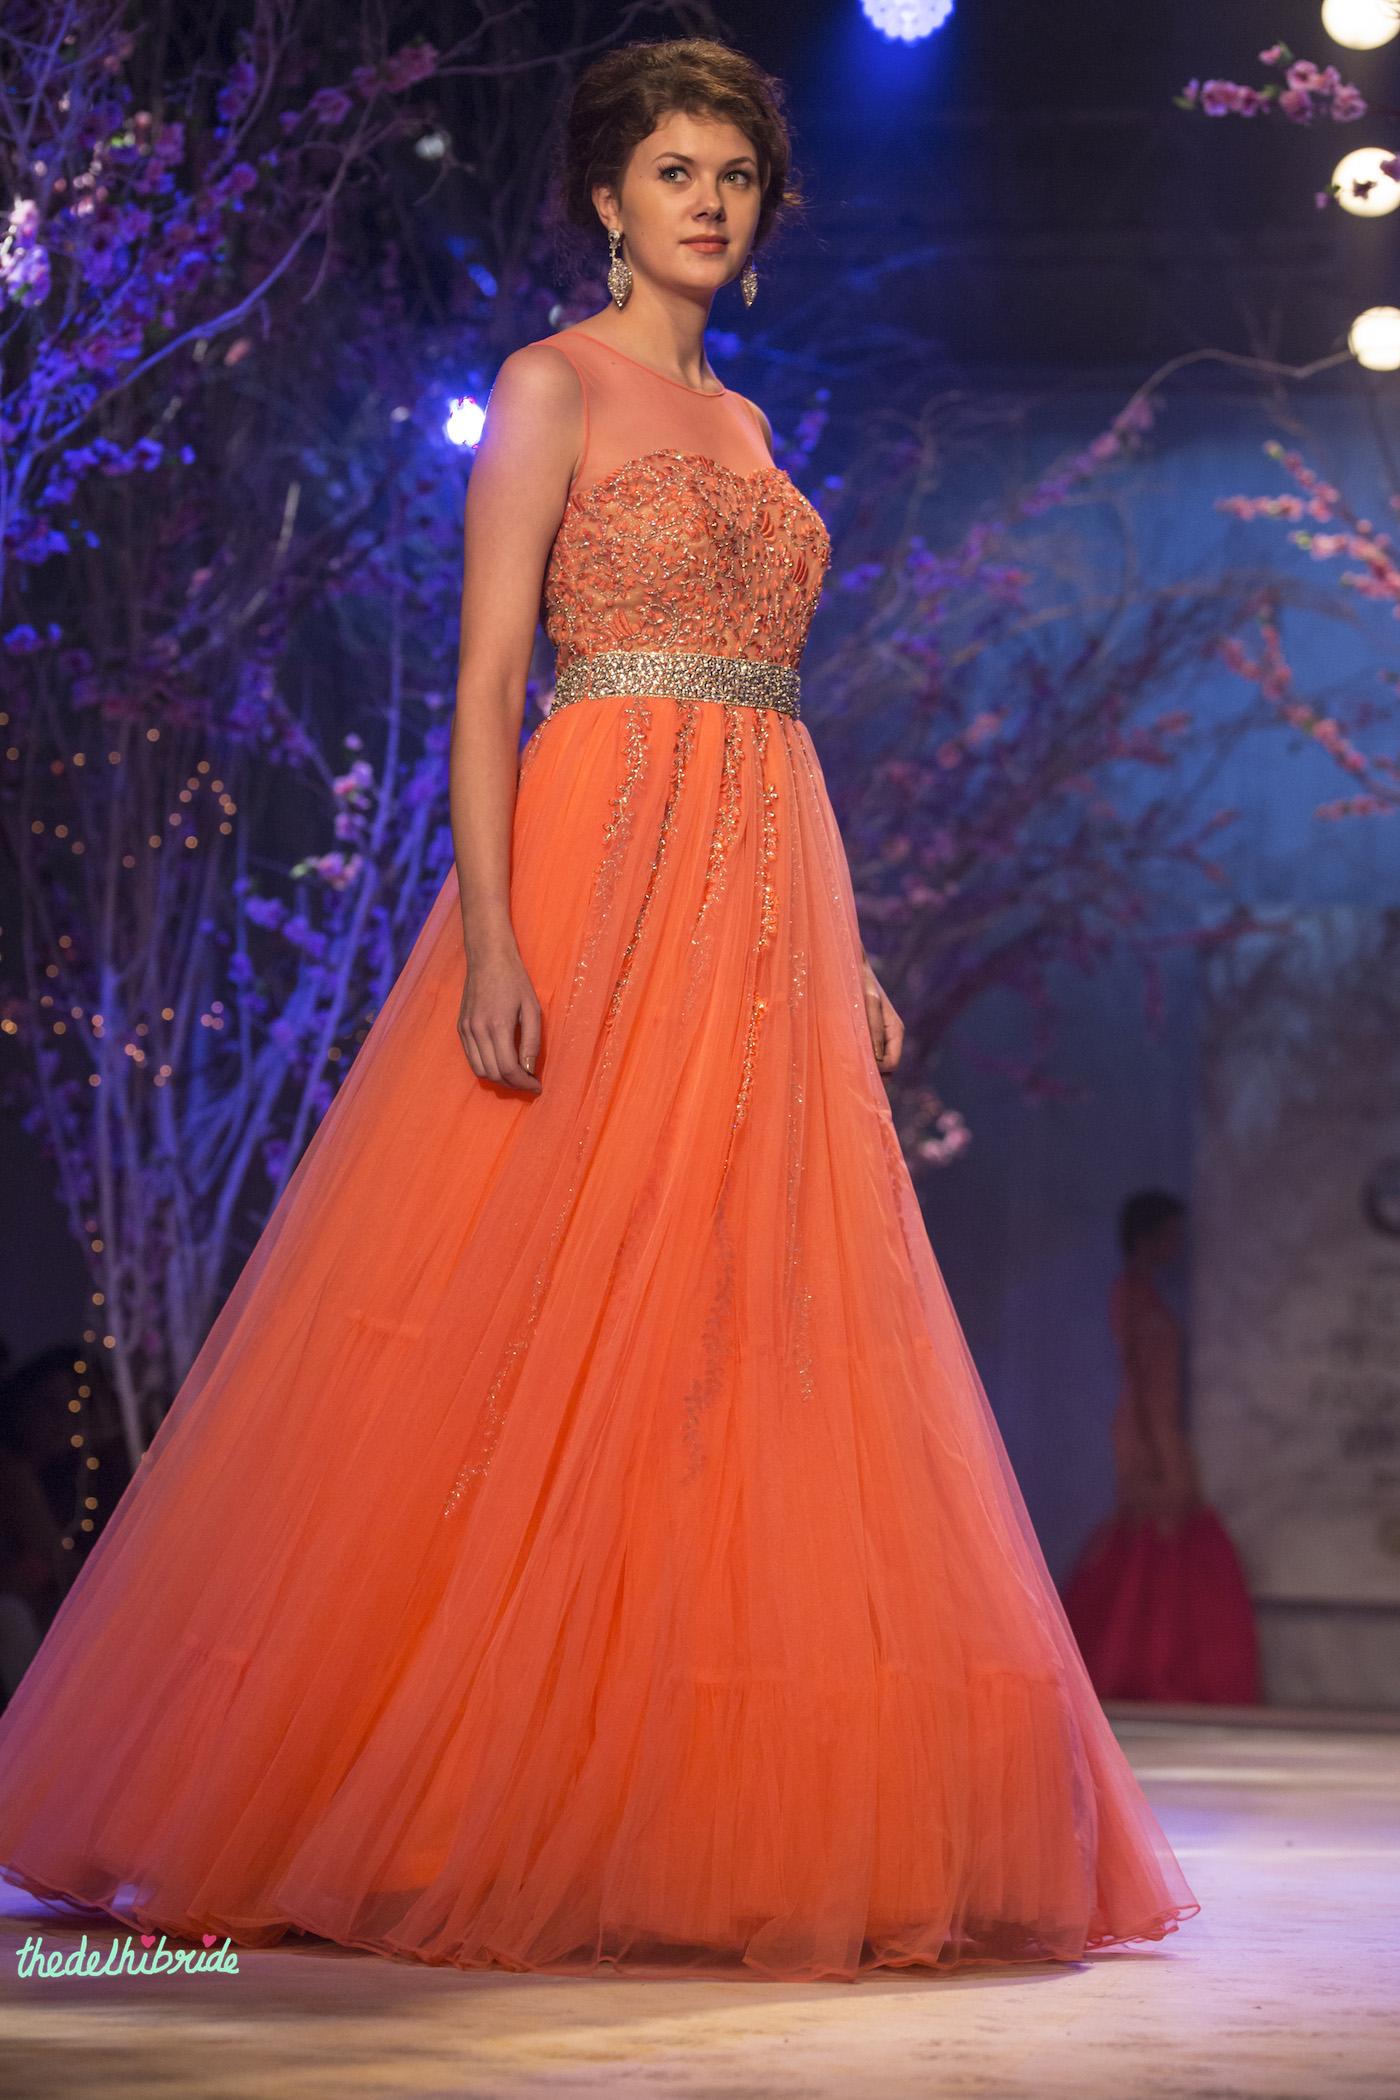 Jyotsna Tiwari At India Bridal Fashion Week 2014 Thedelhibride Indian Weddings Blog